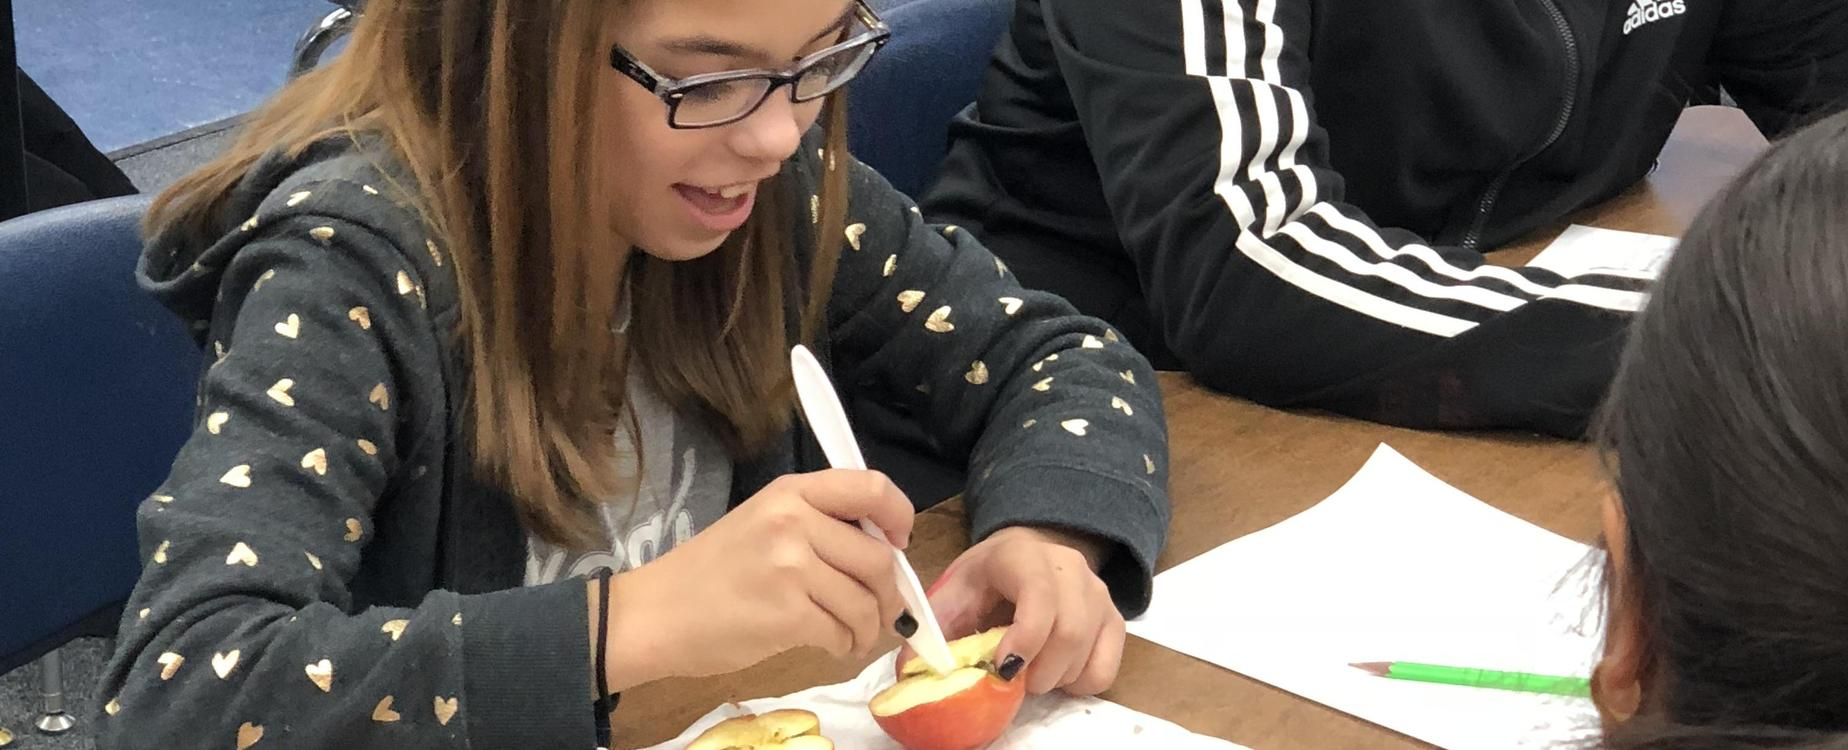 mummifying apples